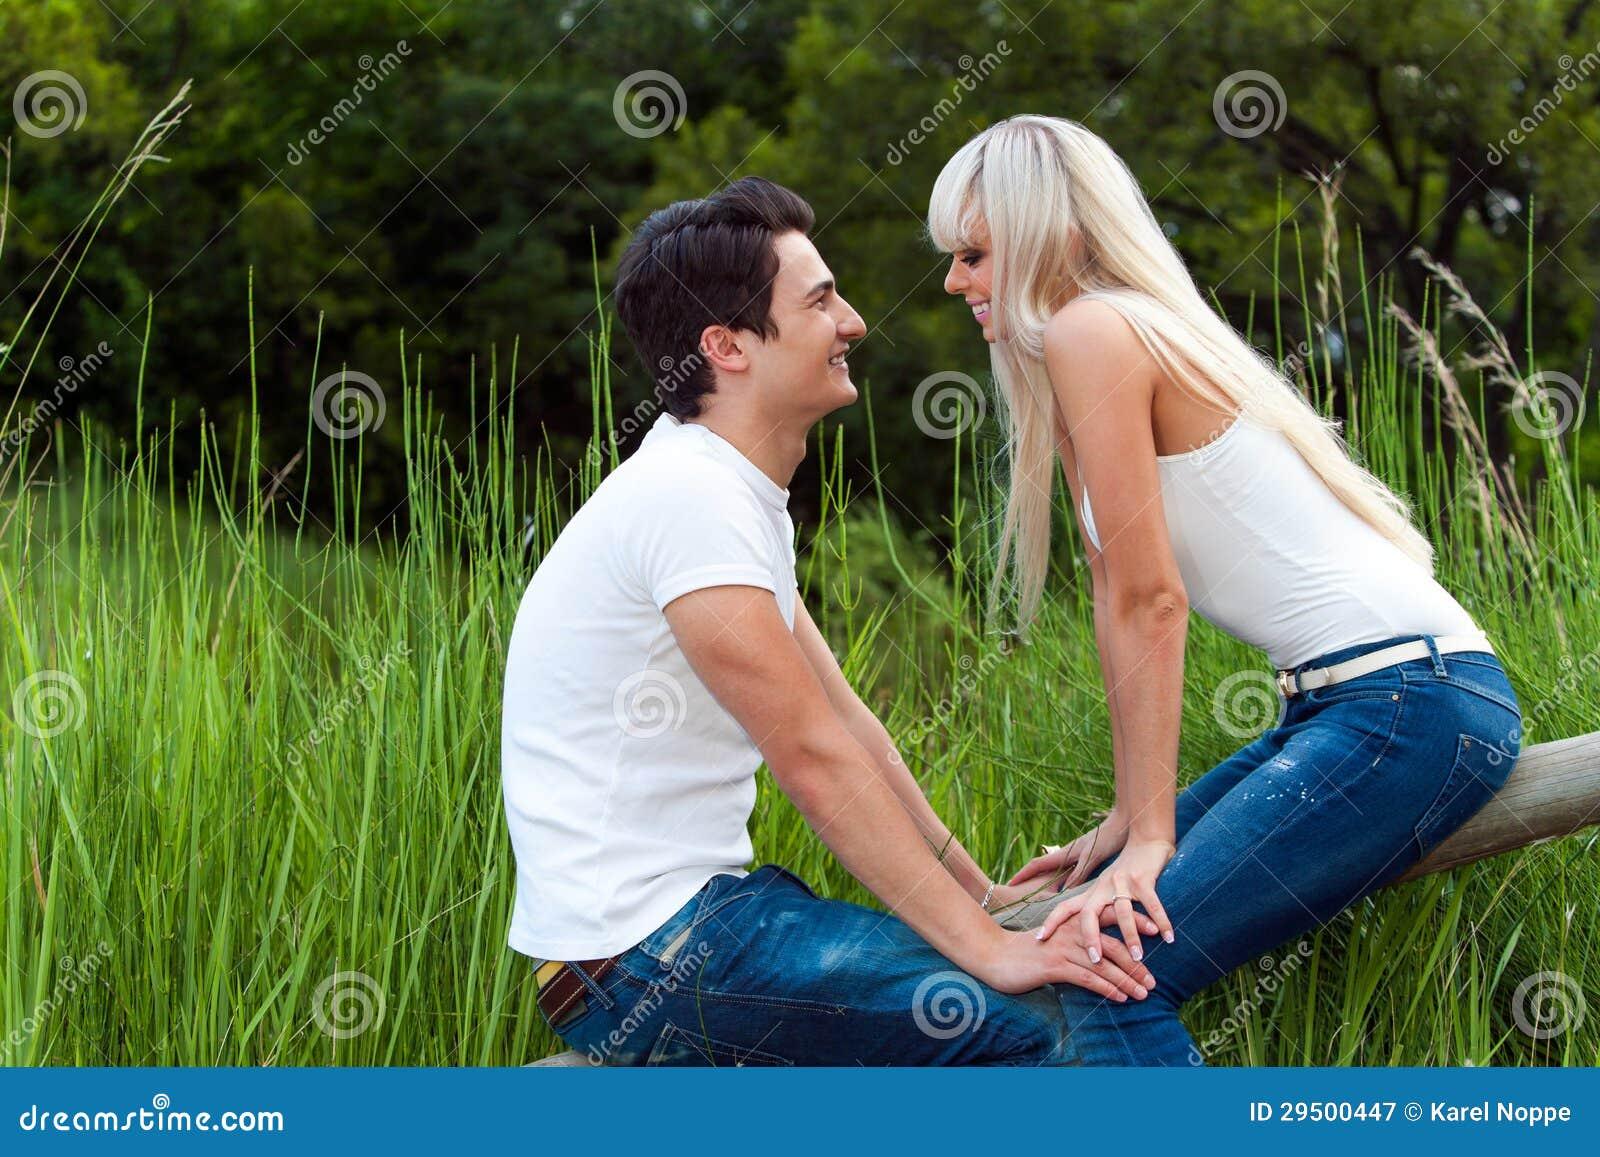 Romantische datum in park.